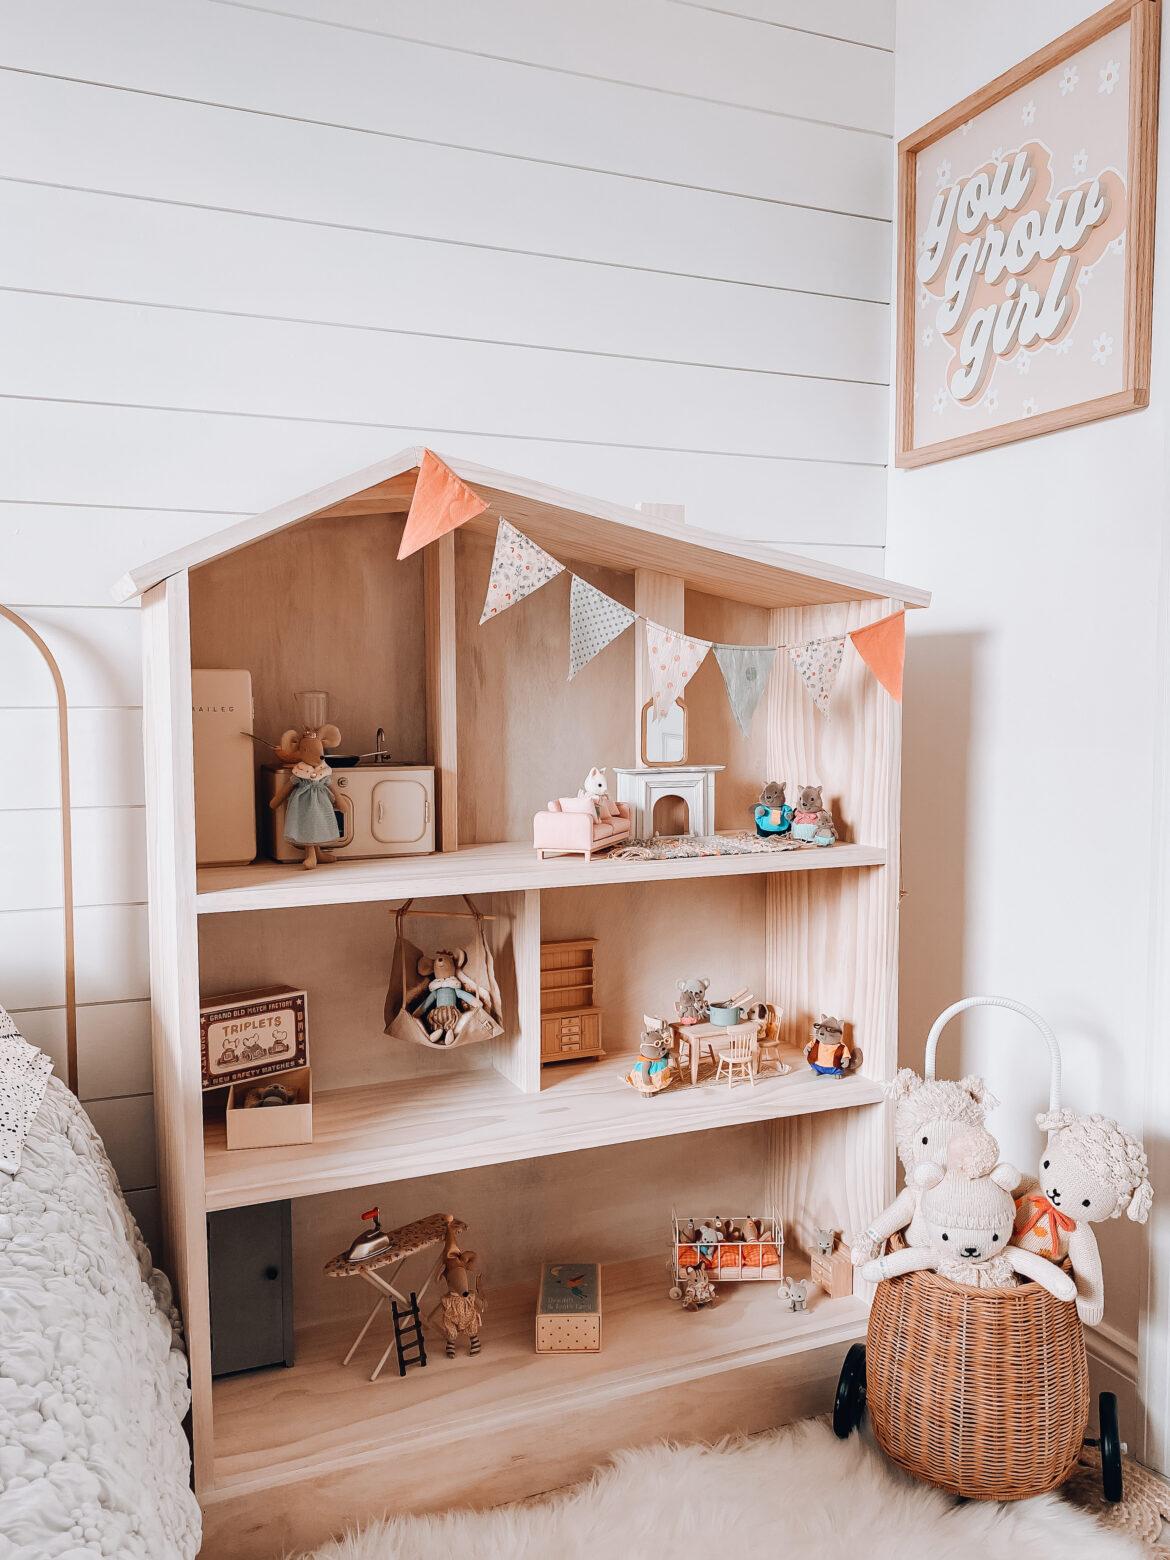 Make a dollhouse yourself!